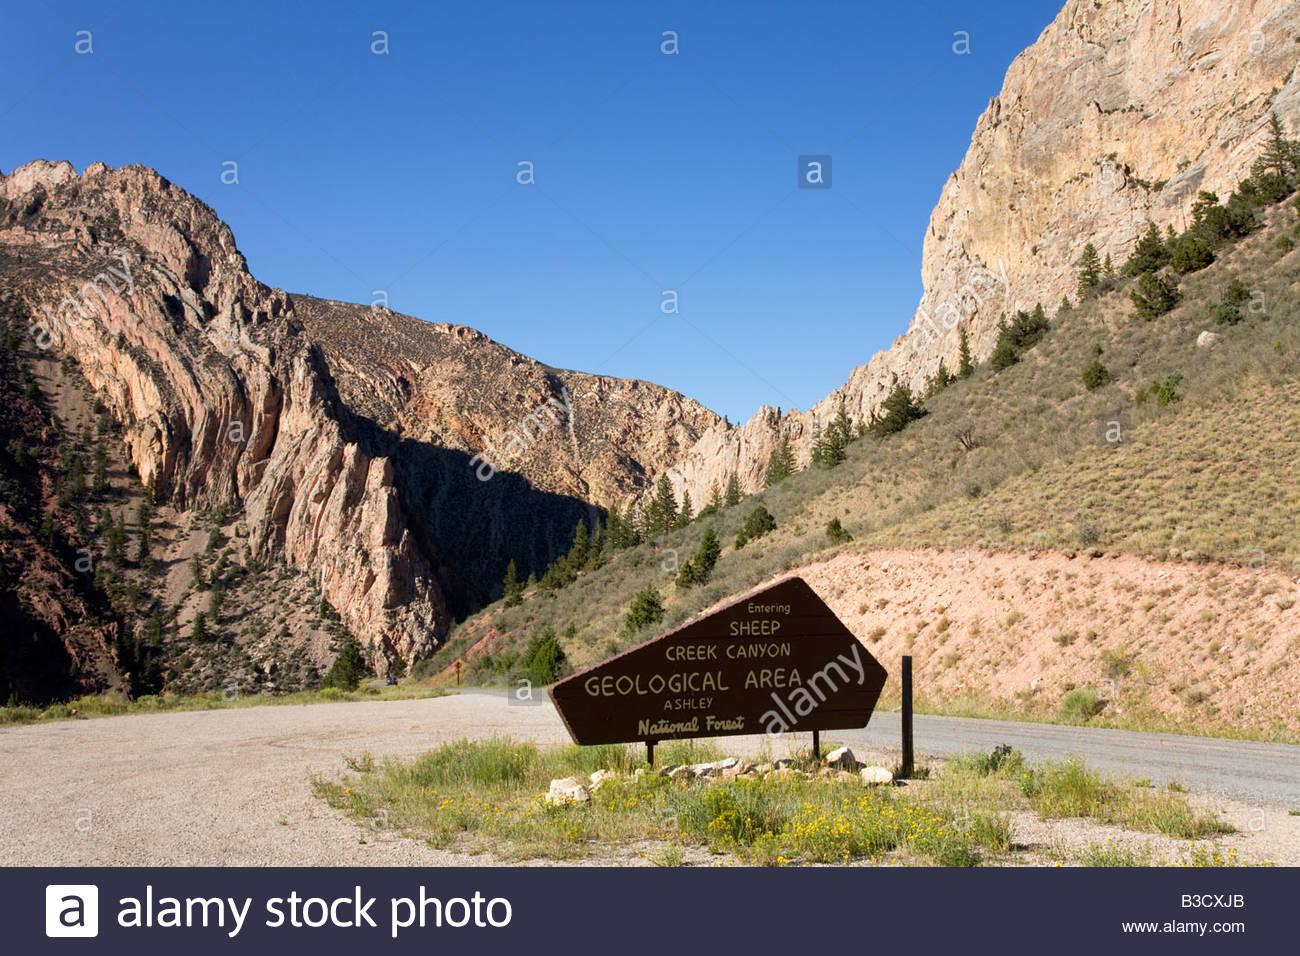 sheep creek canyon geological area ashley national forest folding